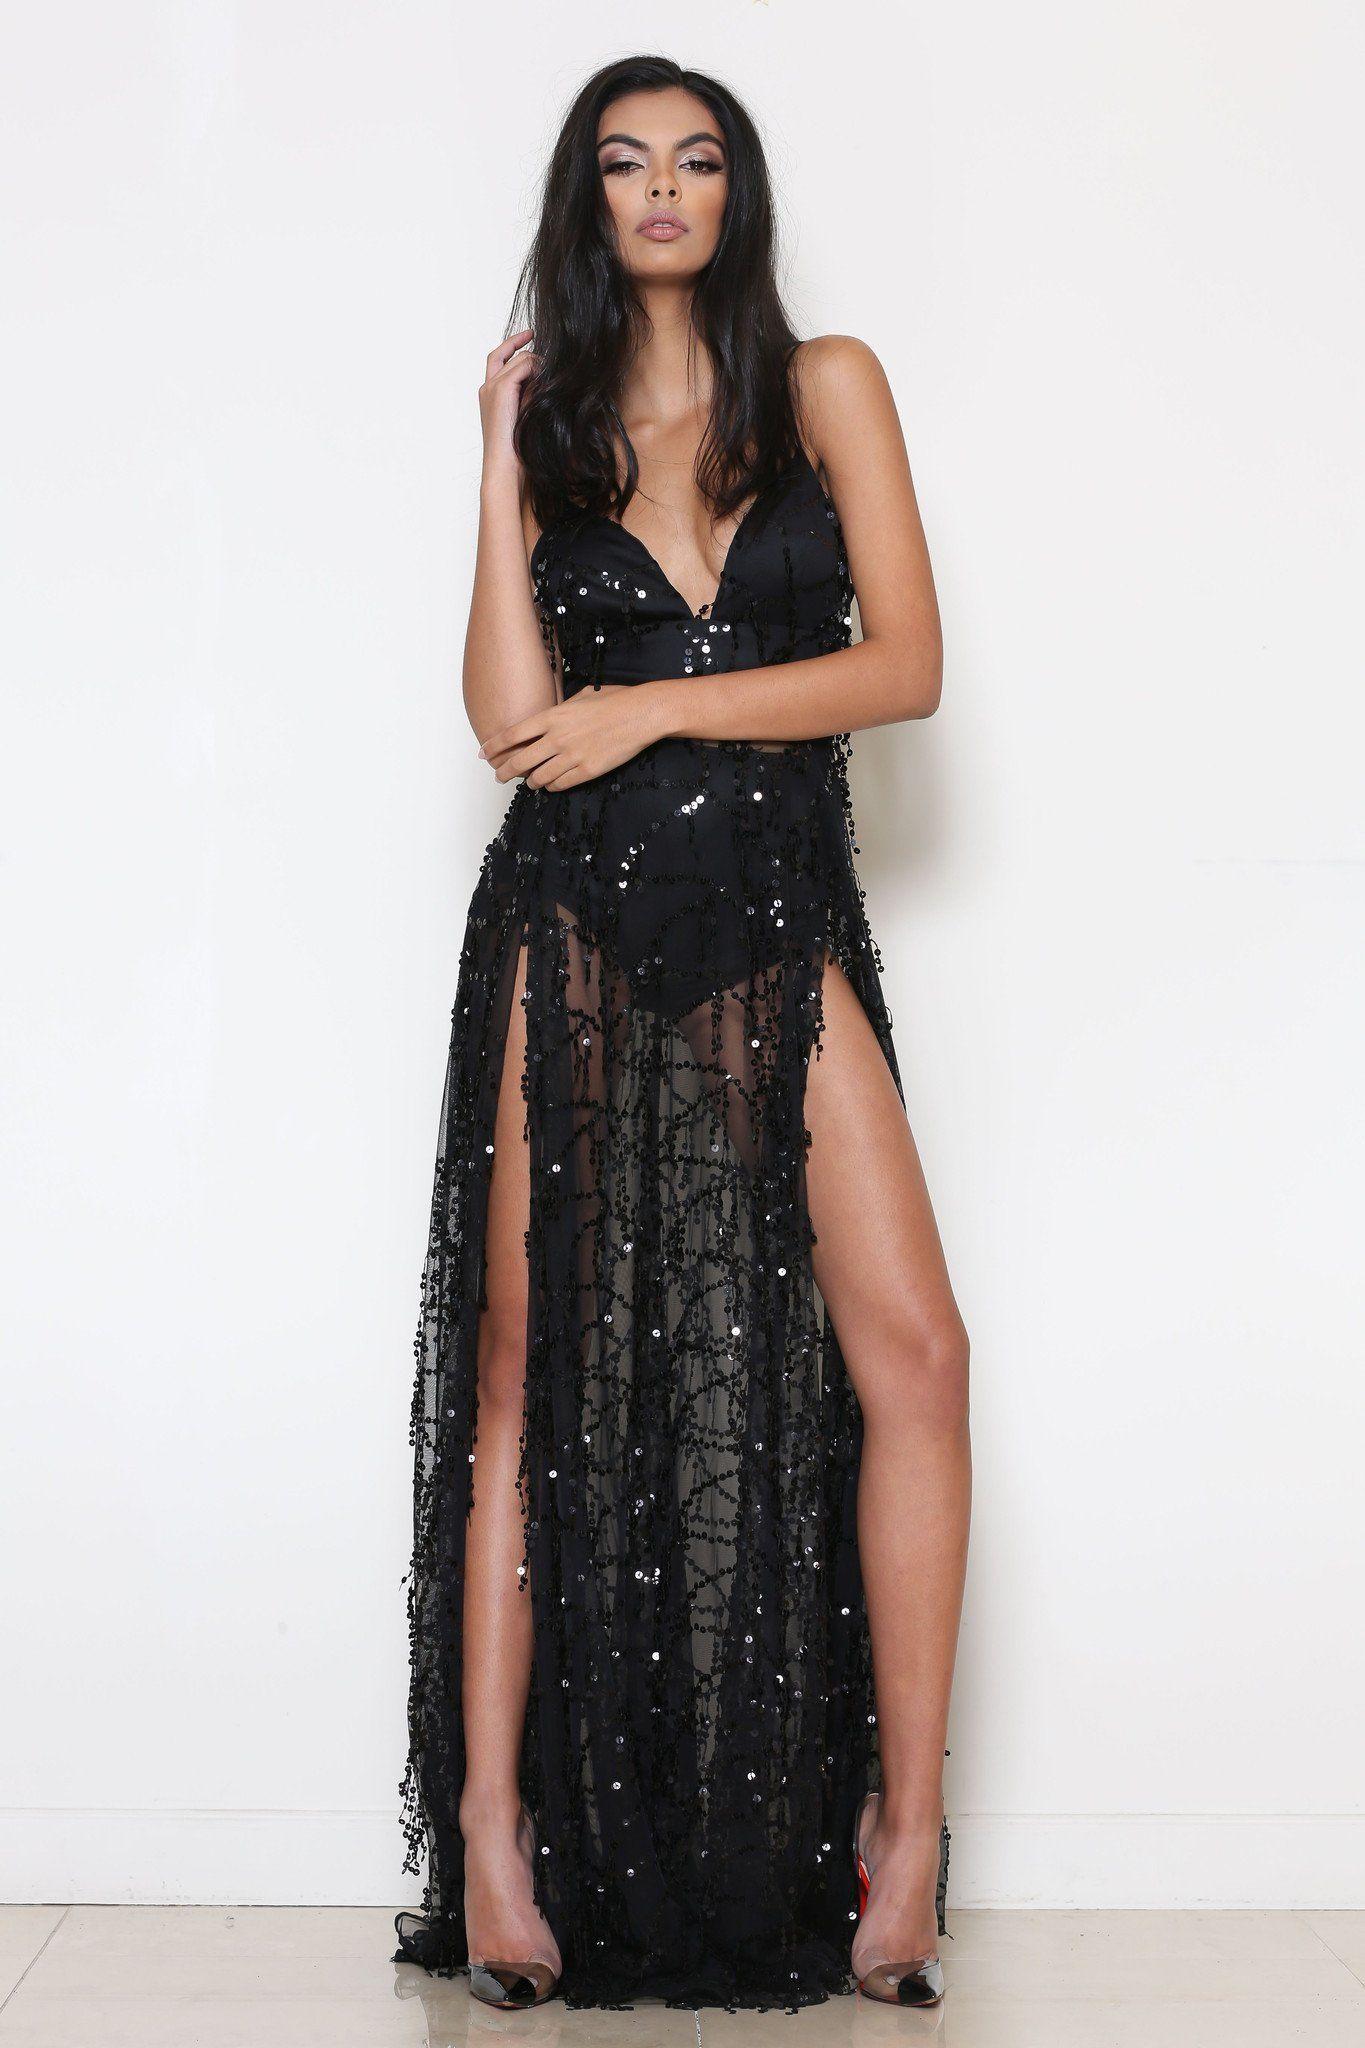 b0737ce8977 Tiana Black Sequin Maxi Dress